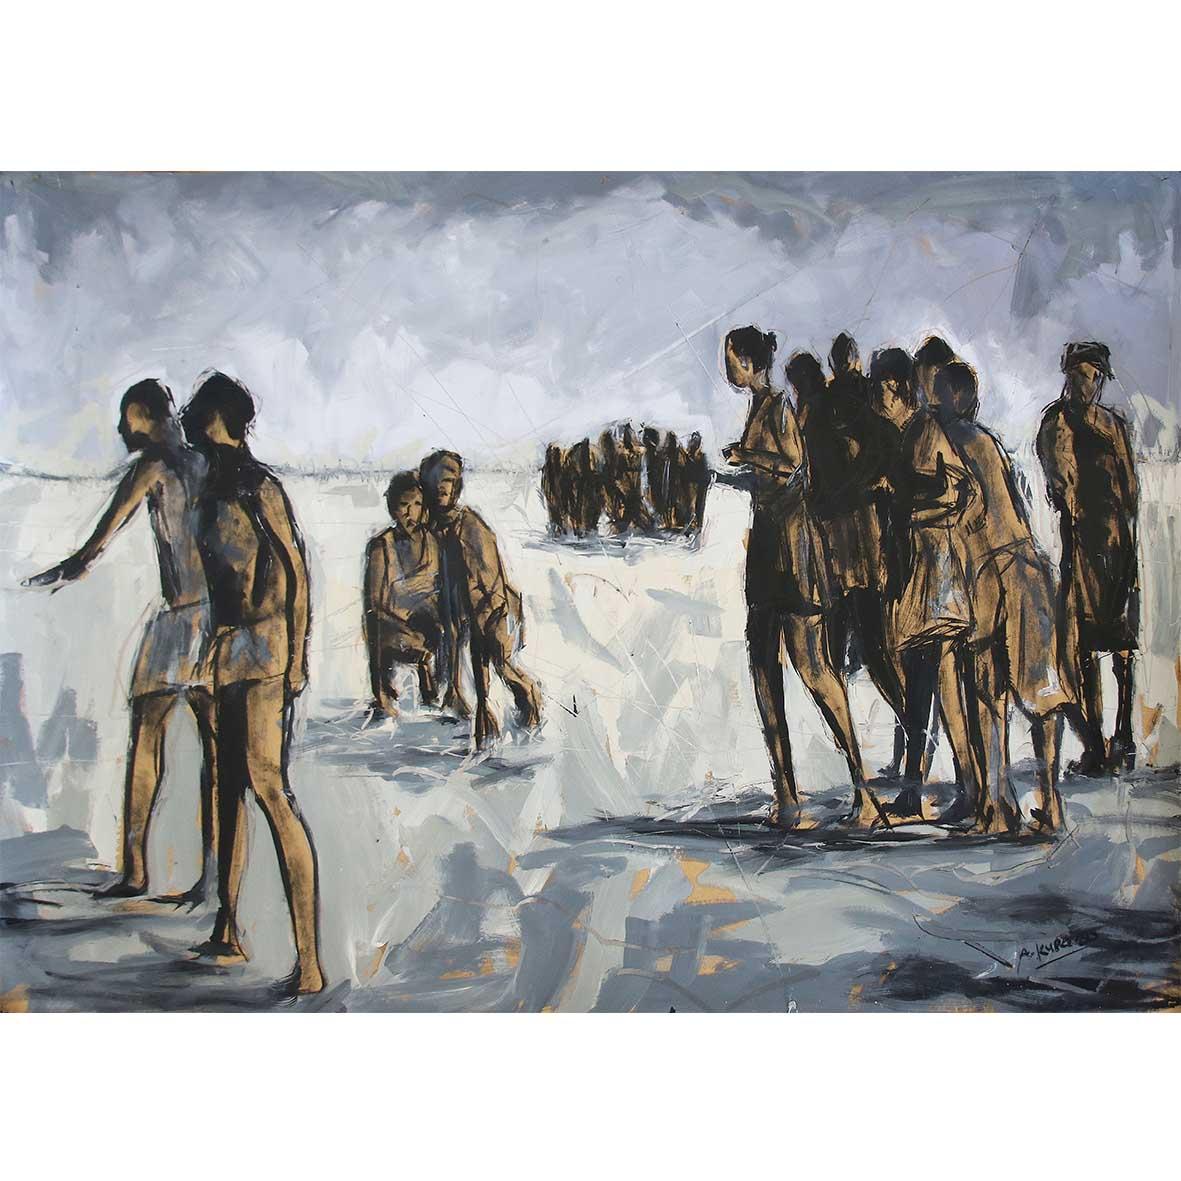 Asanda Kupa Life line Oil on paper 90 x 140 cm,